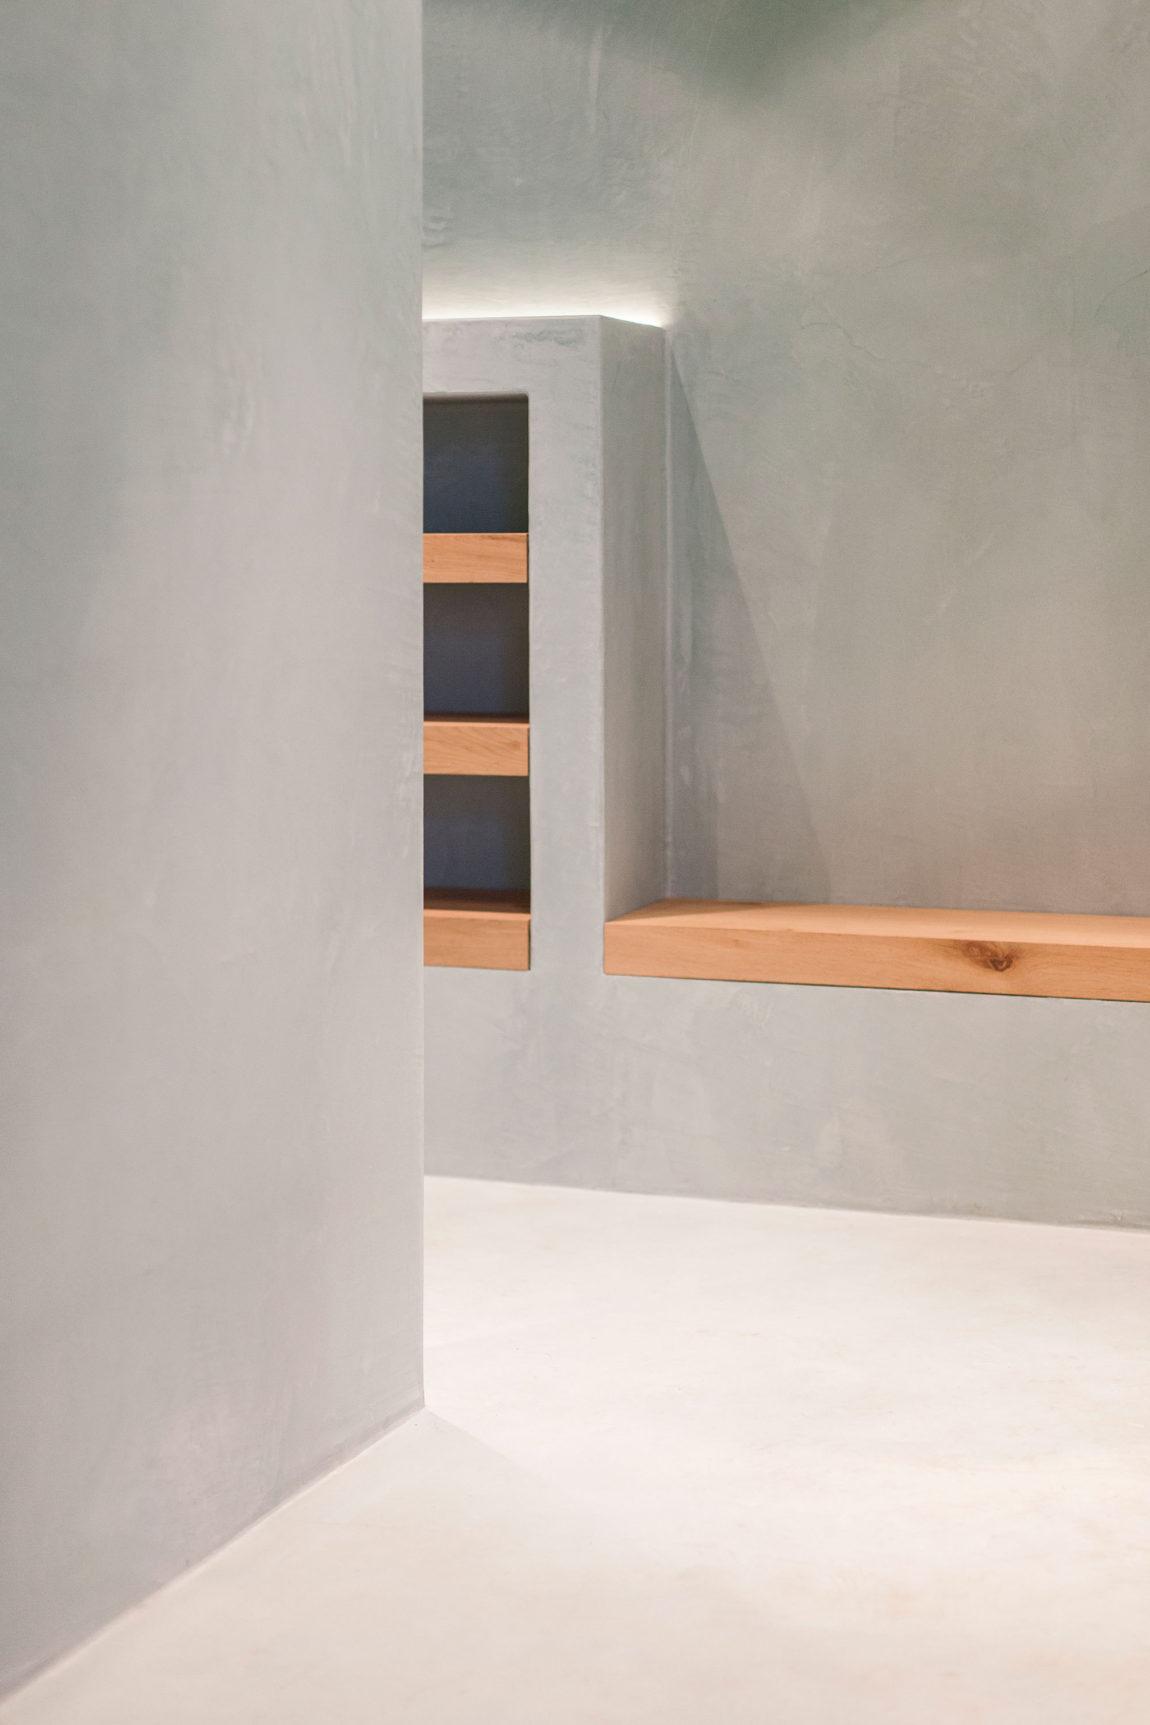 Interieur schuur LM badkamer IMG 1325